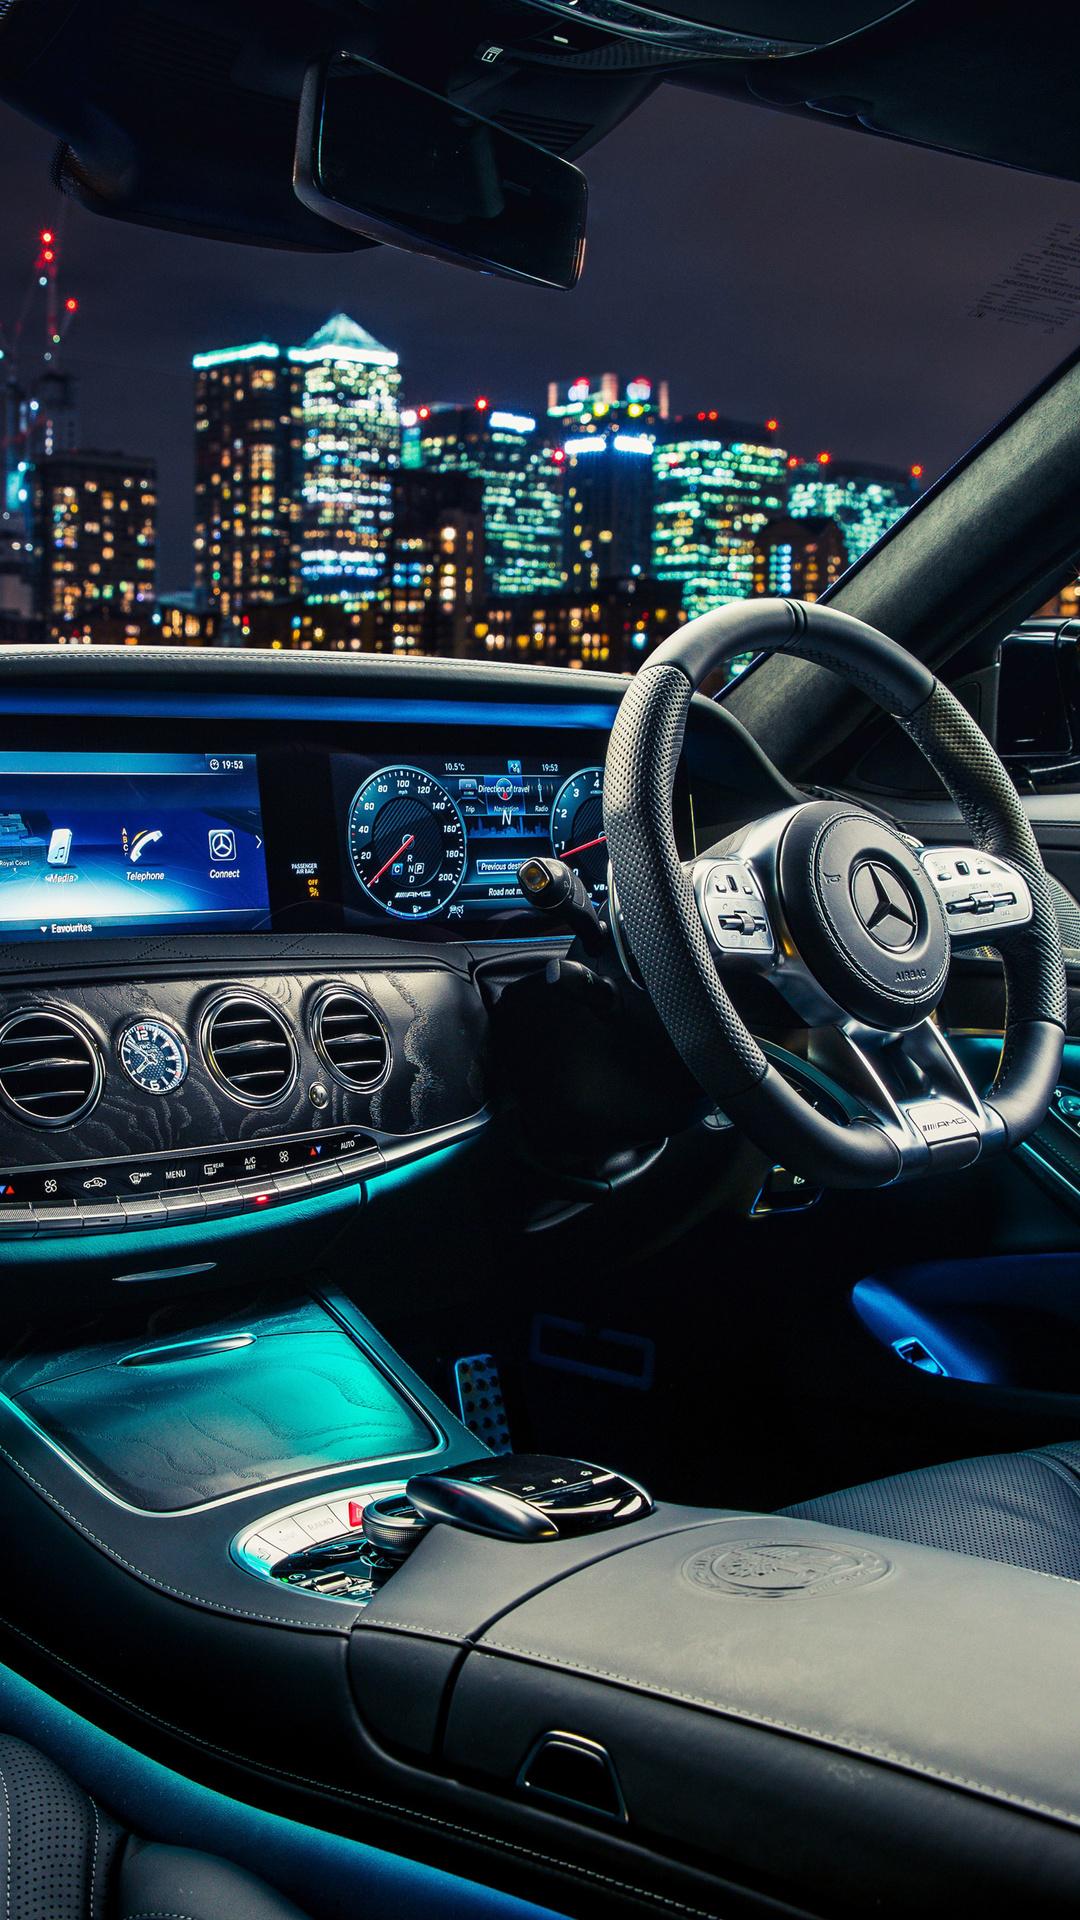 1080x1920 Mercedes AMG S 63 4MATIC Interior Iphone 7,6s,6 ...